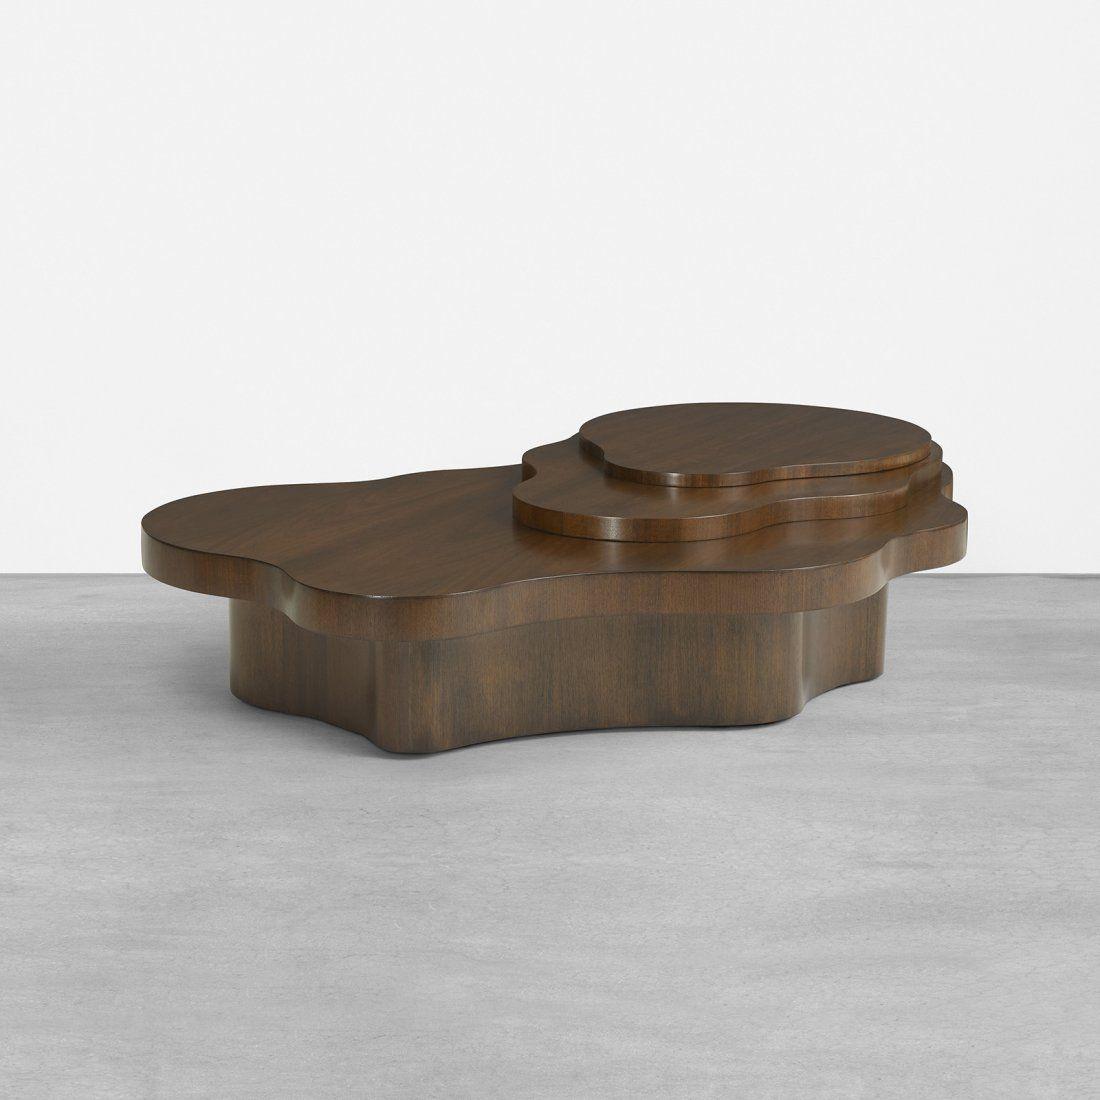 T H Robsjohn Gibbings 17660 6 Walnut Mesa Coffee Table For Widdicomb 1952